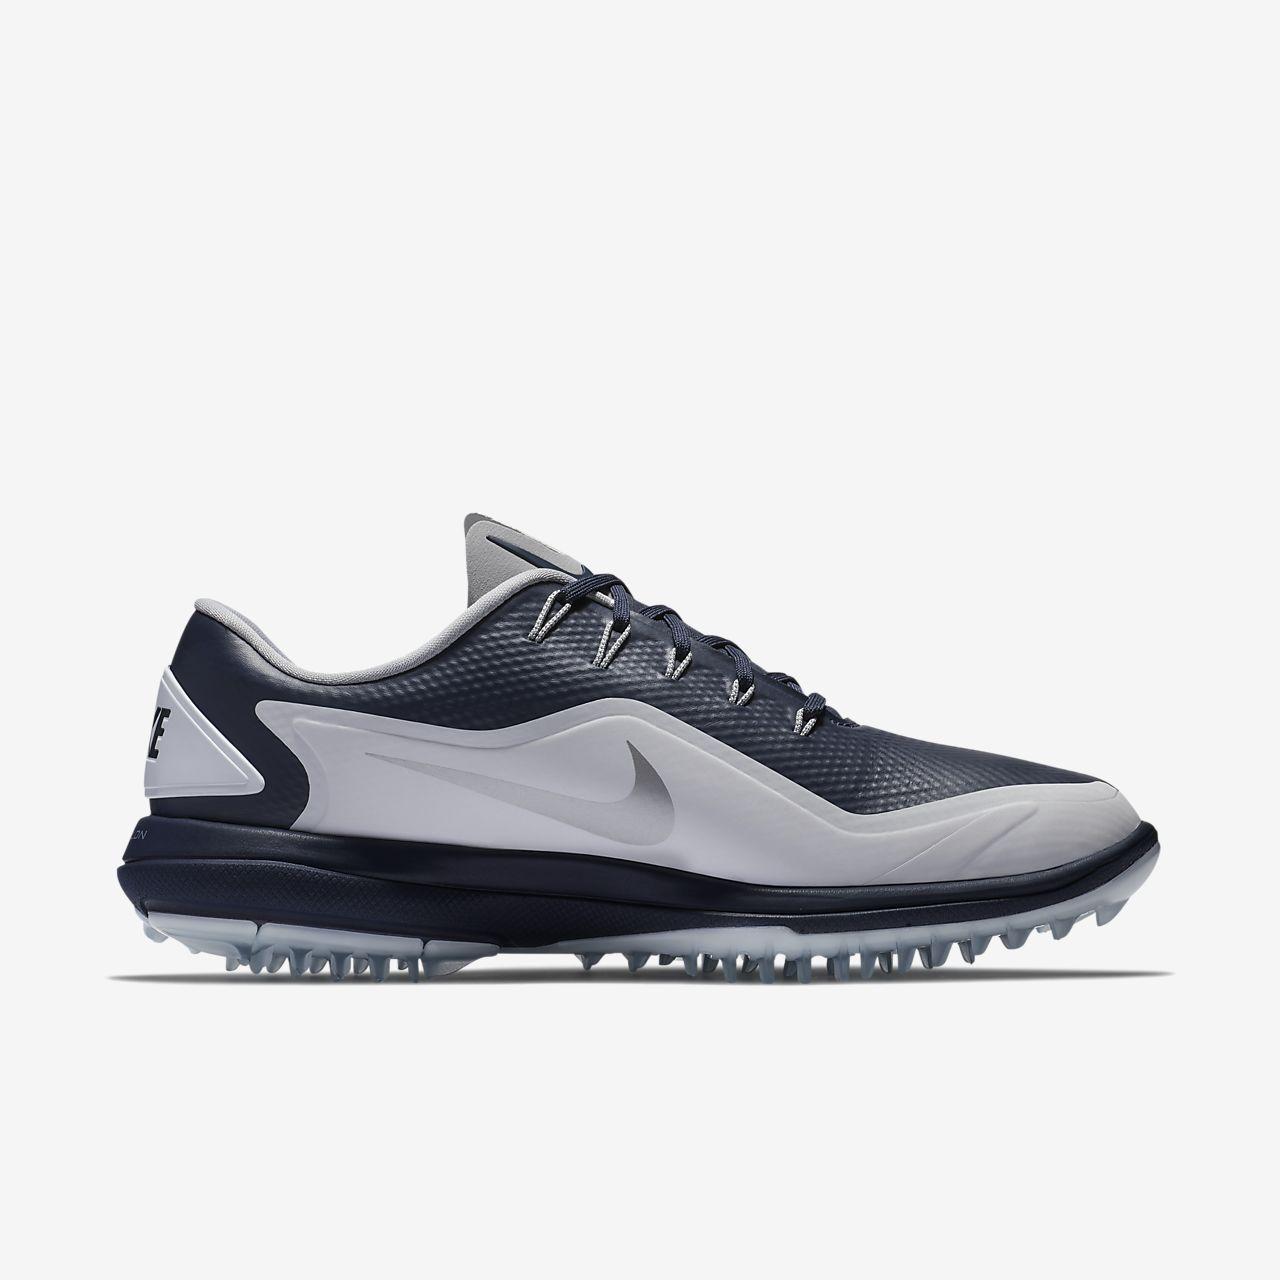 ... Nike Lunar Control Vapor 2 Men's Golf Shoe